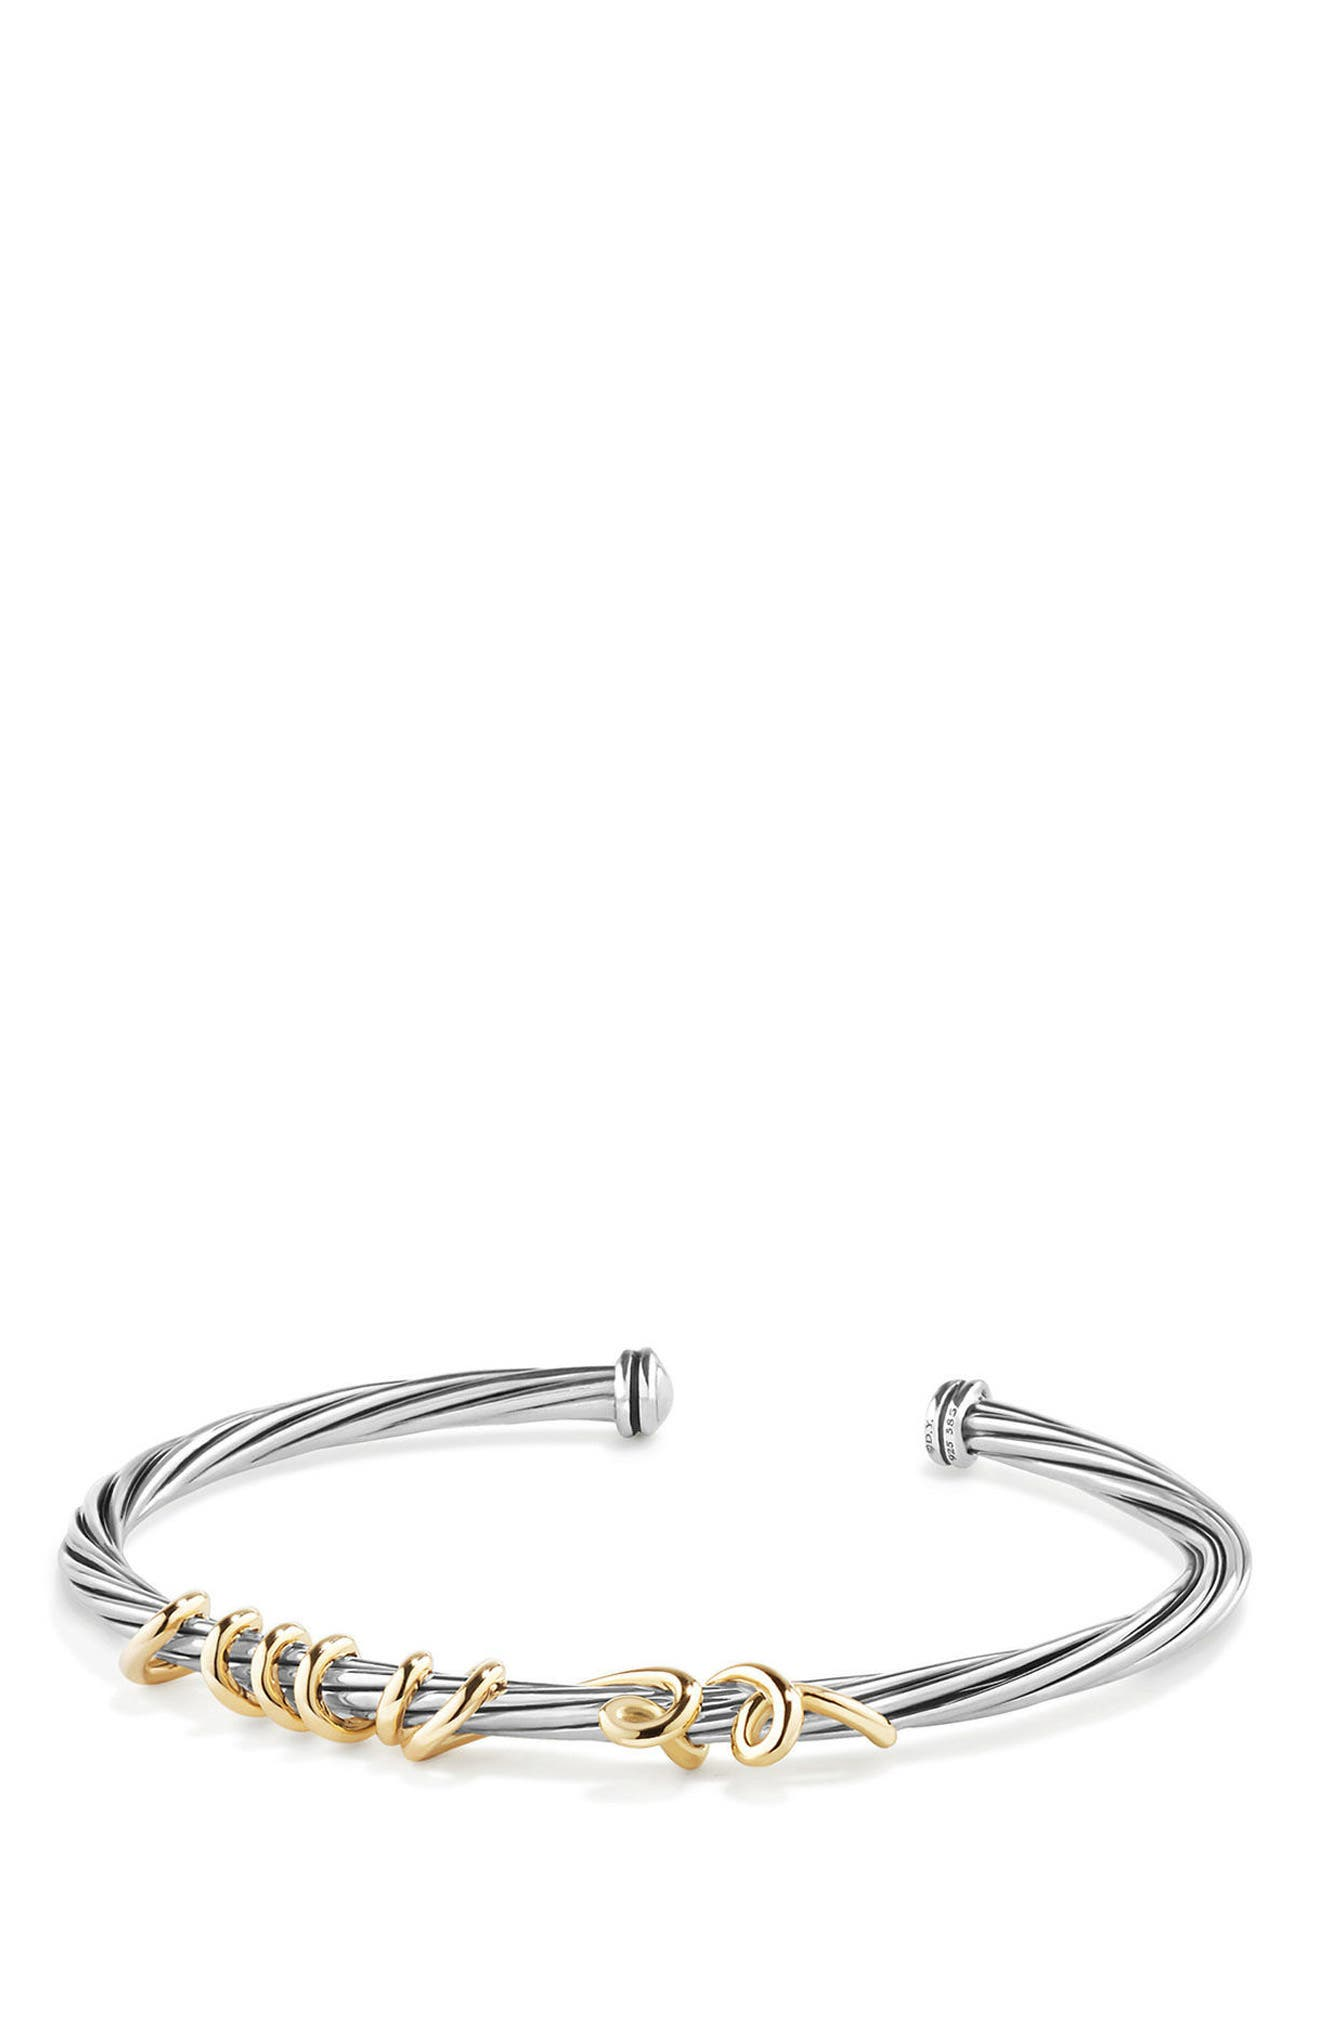 Whispers Te Amo Bracelet,                         Main,                         color, SILVER/ GOLD